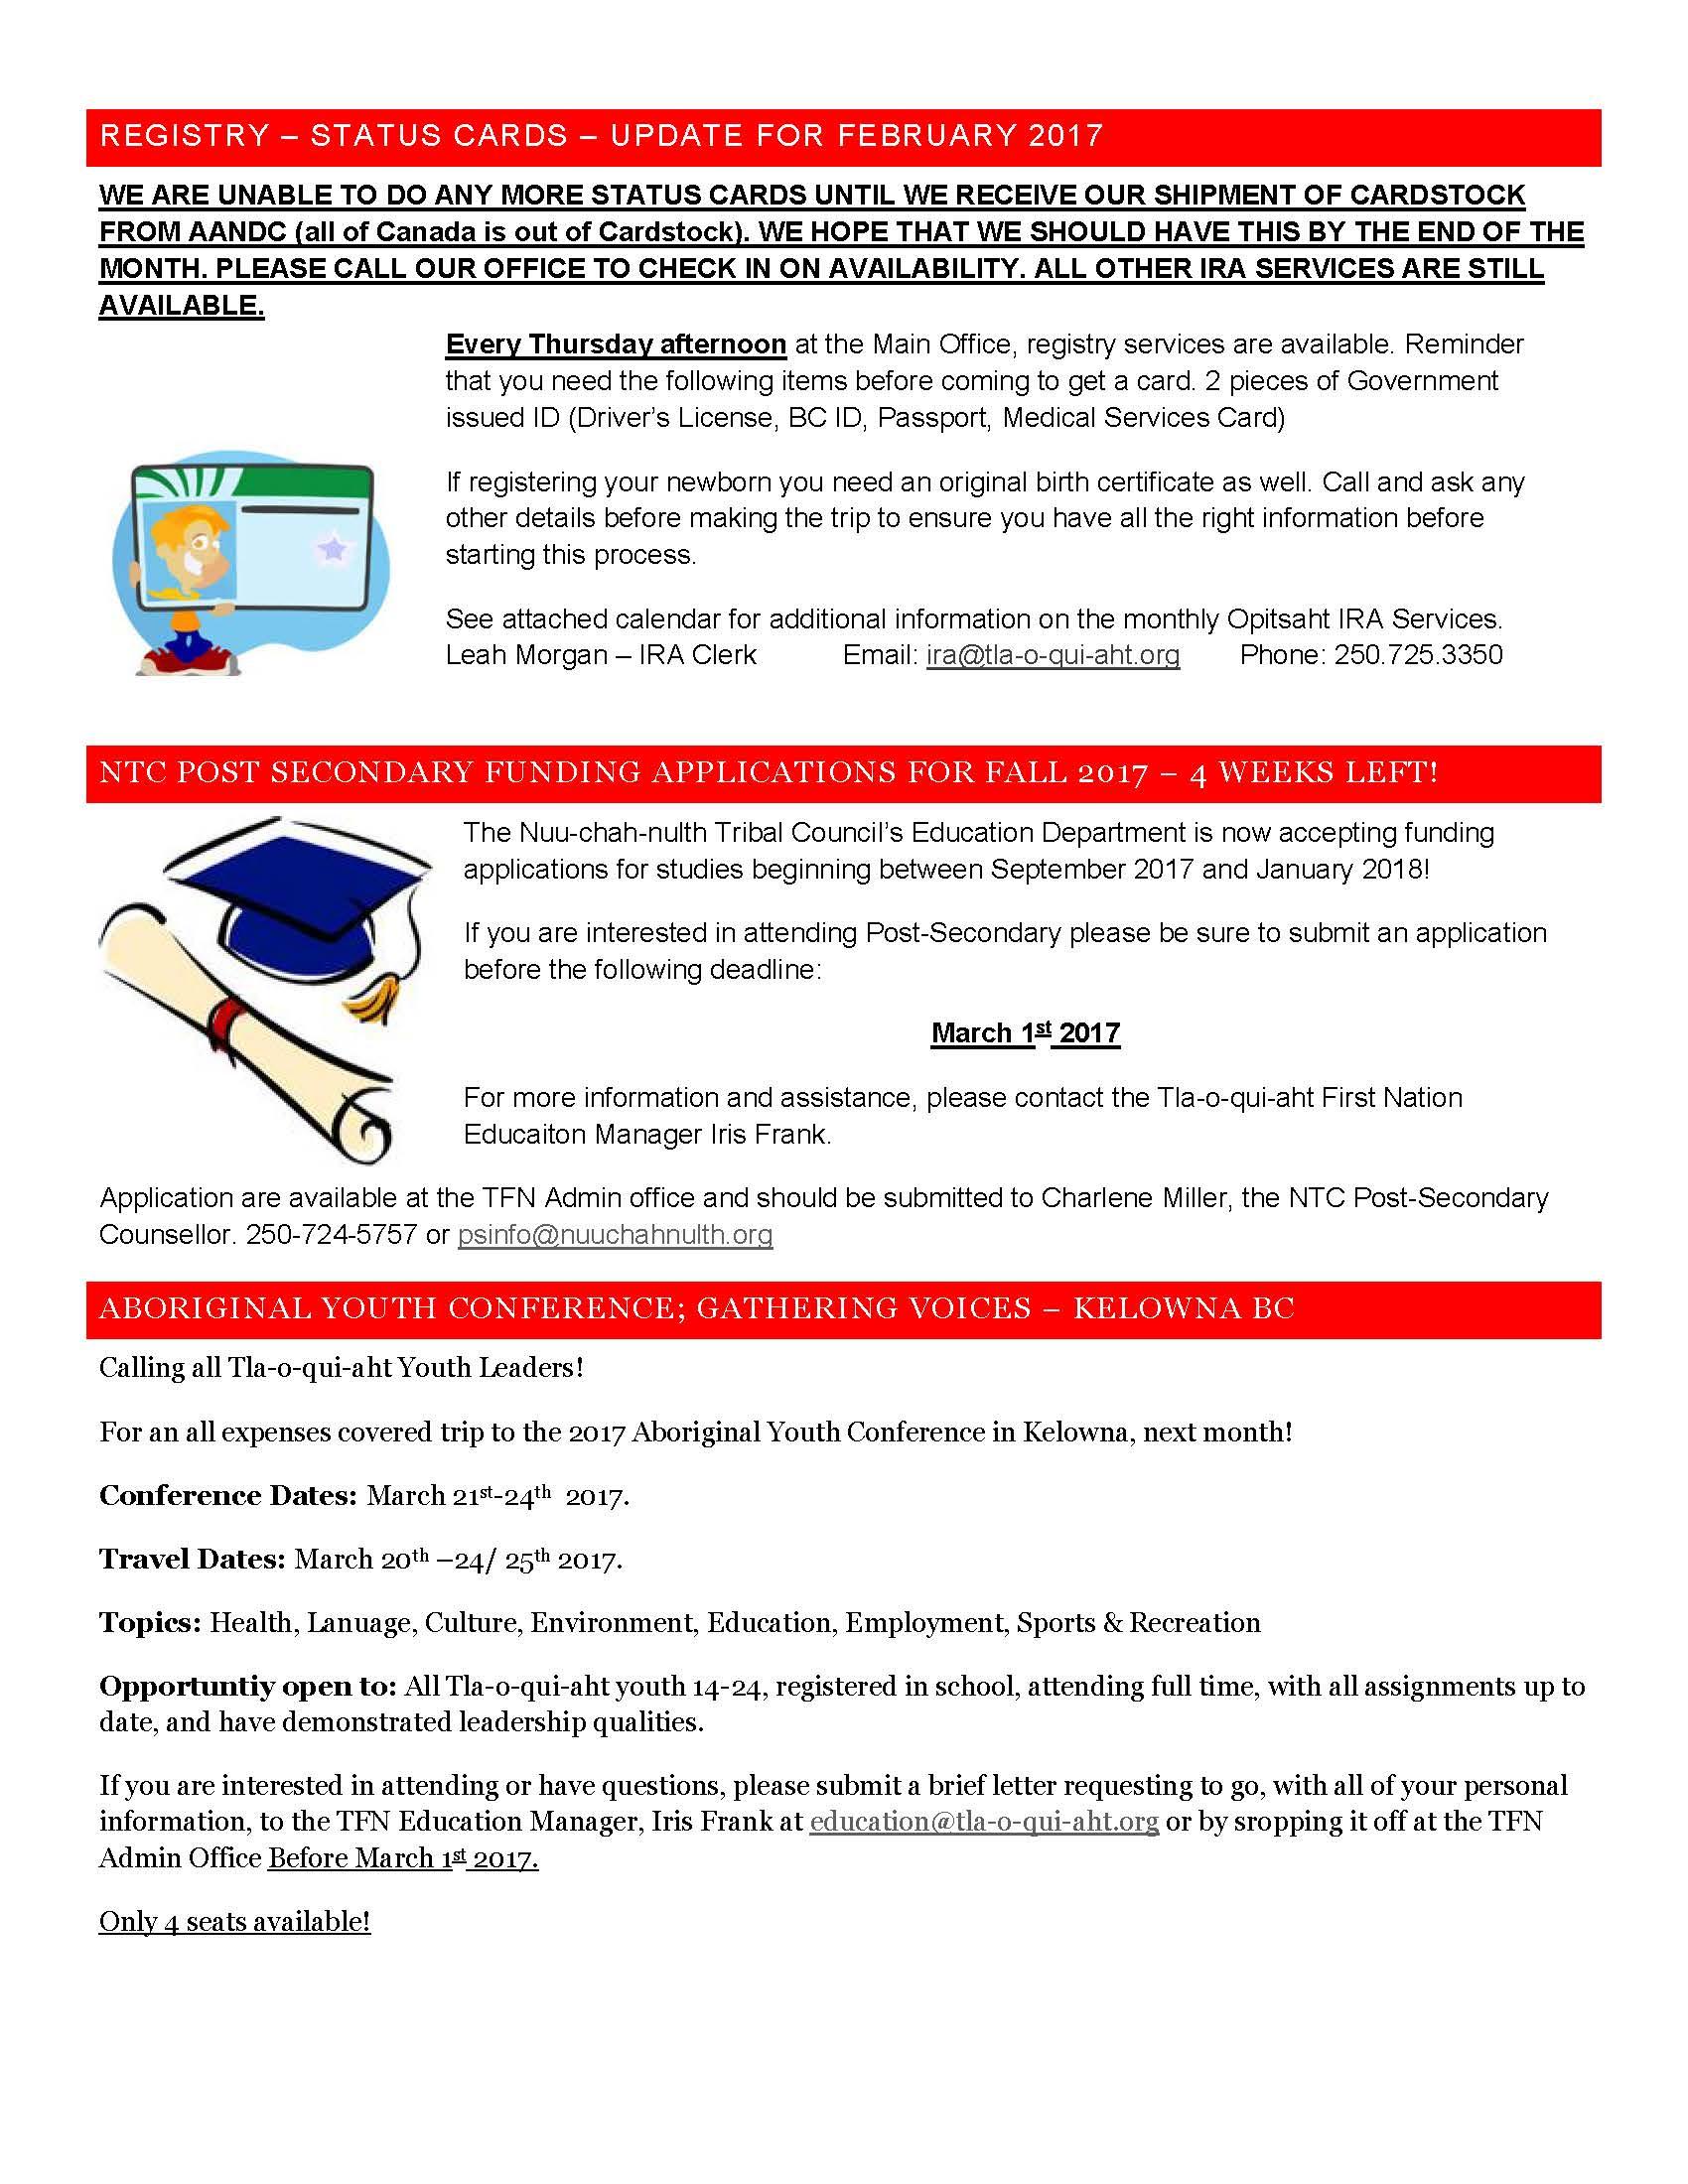 TFN Bulletin Feb1-2017_Page_04.jpg